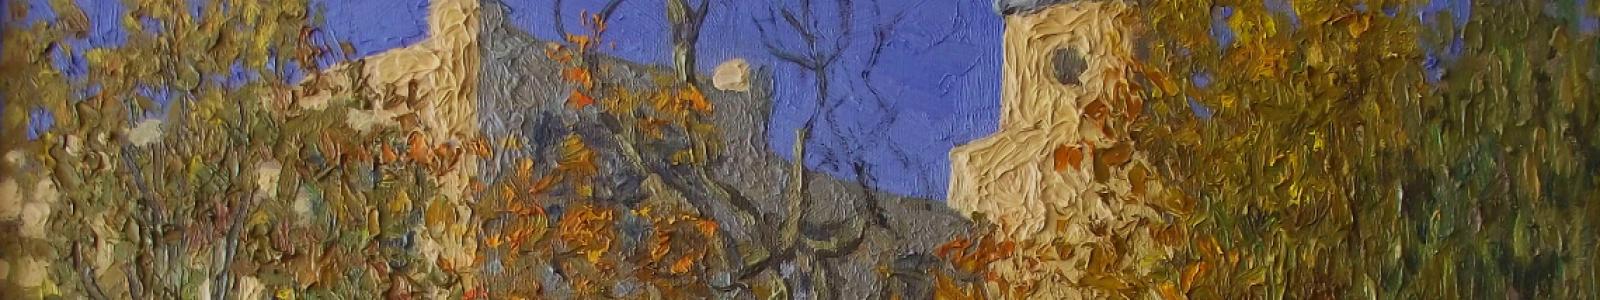 Gallery Painter Vasiliy Molokov